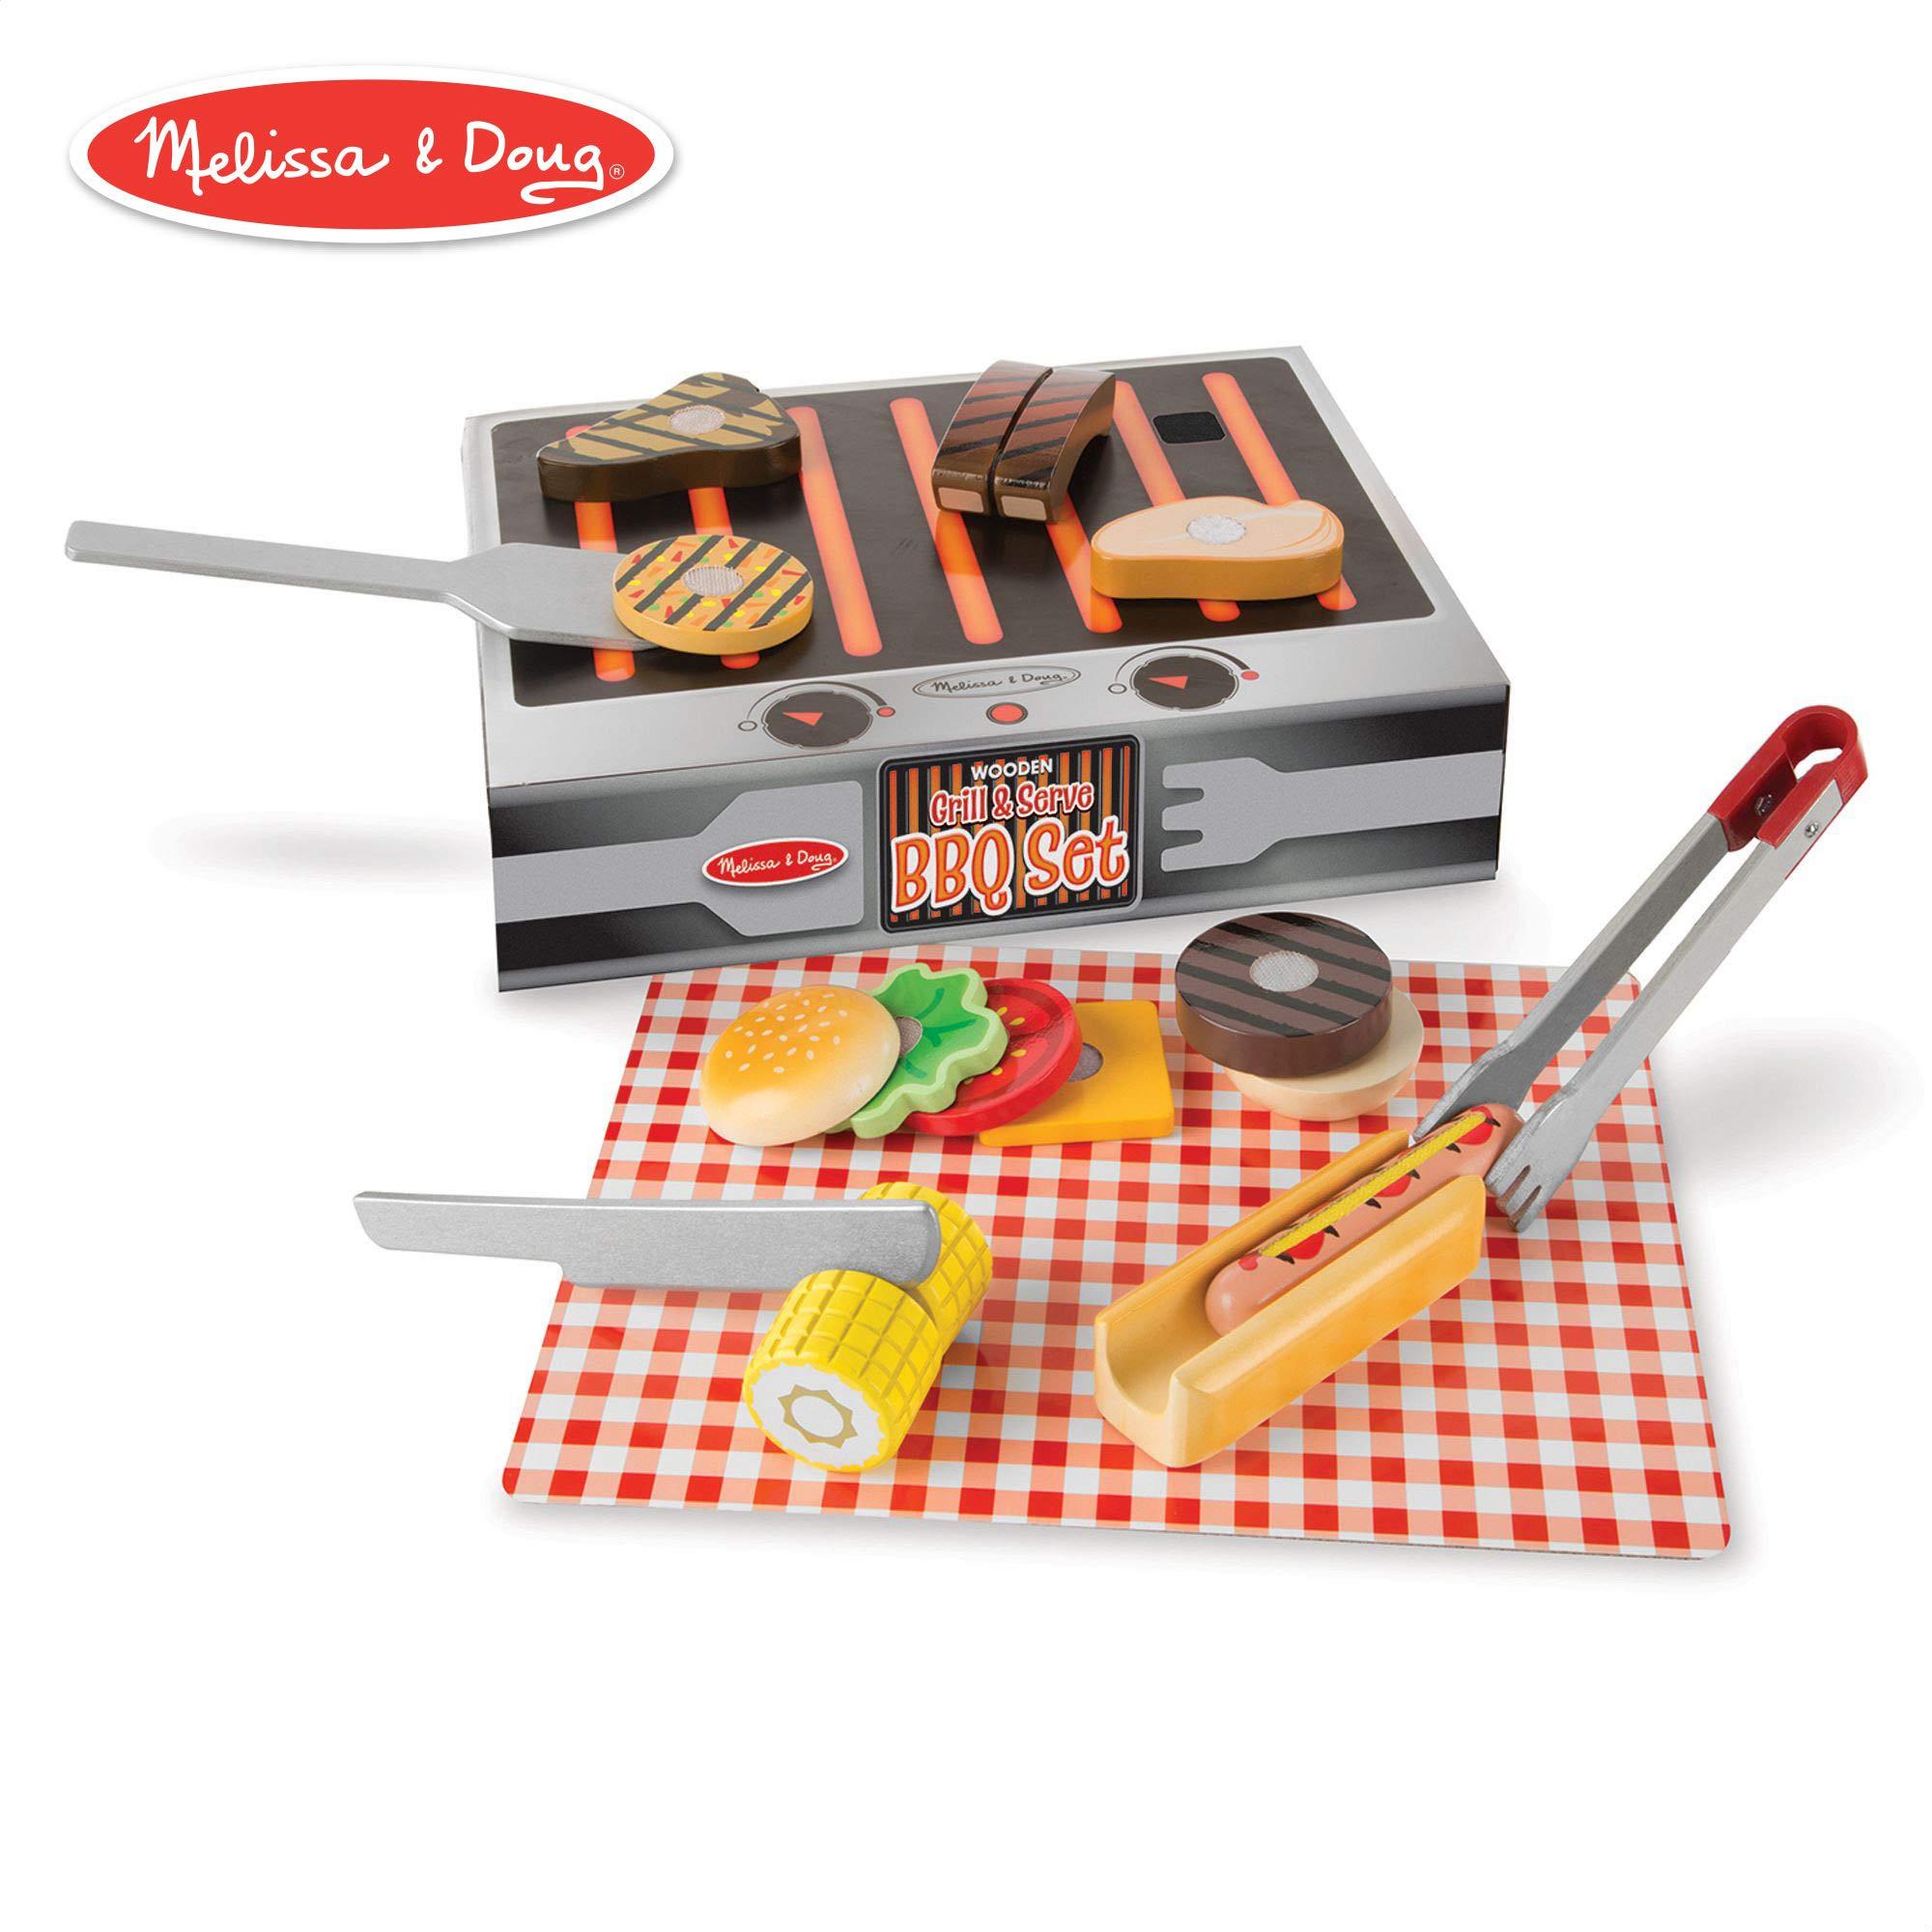 Melissa & Doug Wooden Grill & Serve BBQ Set (Wooden Play Food, 20 Pieces)